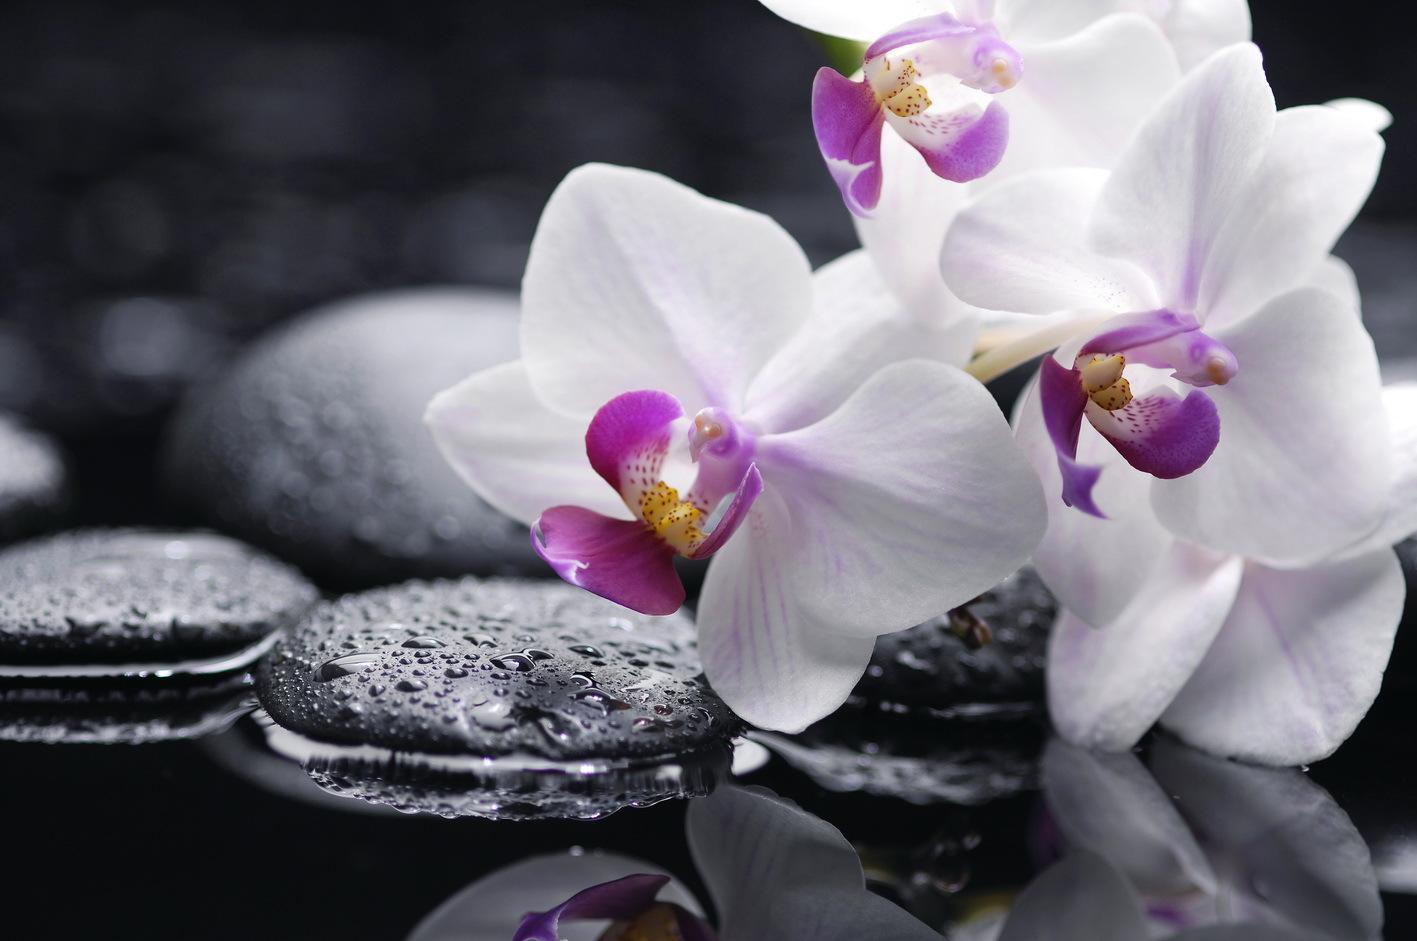 Shenzhen Nongke Orchid HD Wallpaper